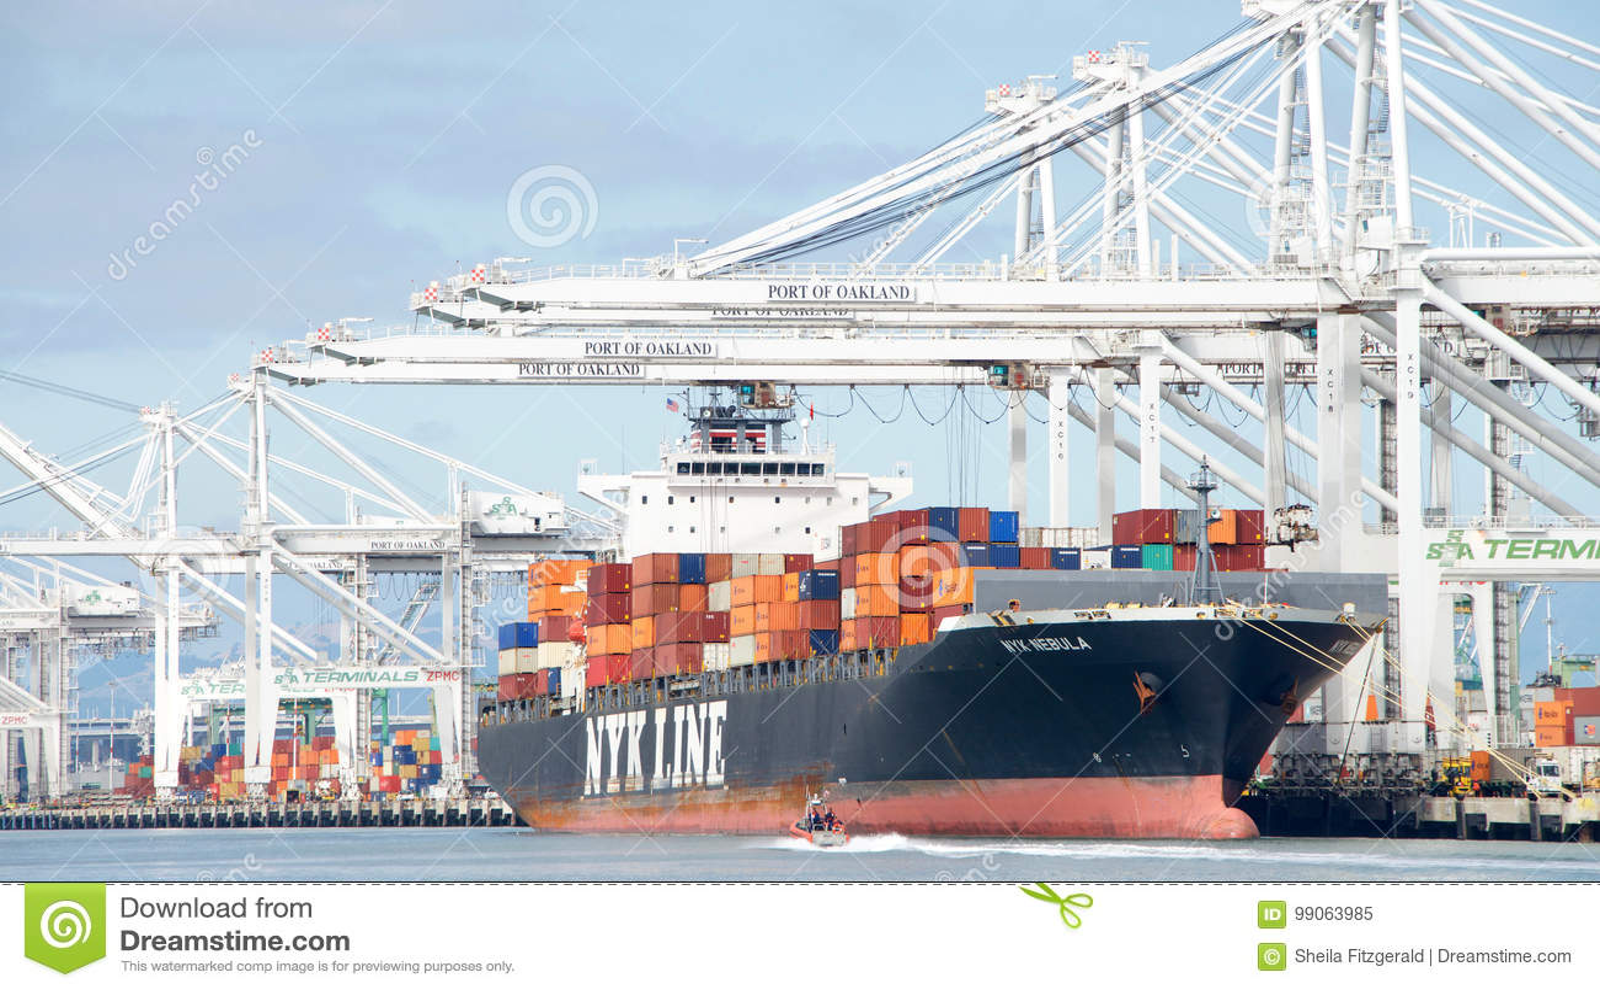 Cargo Ship NYK NEBULA Loading At The Port Of Oakland Editorial Image